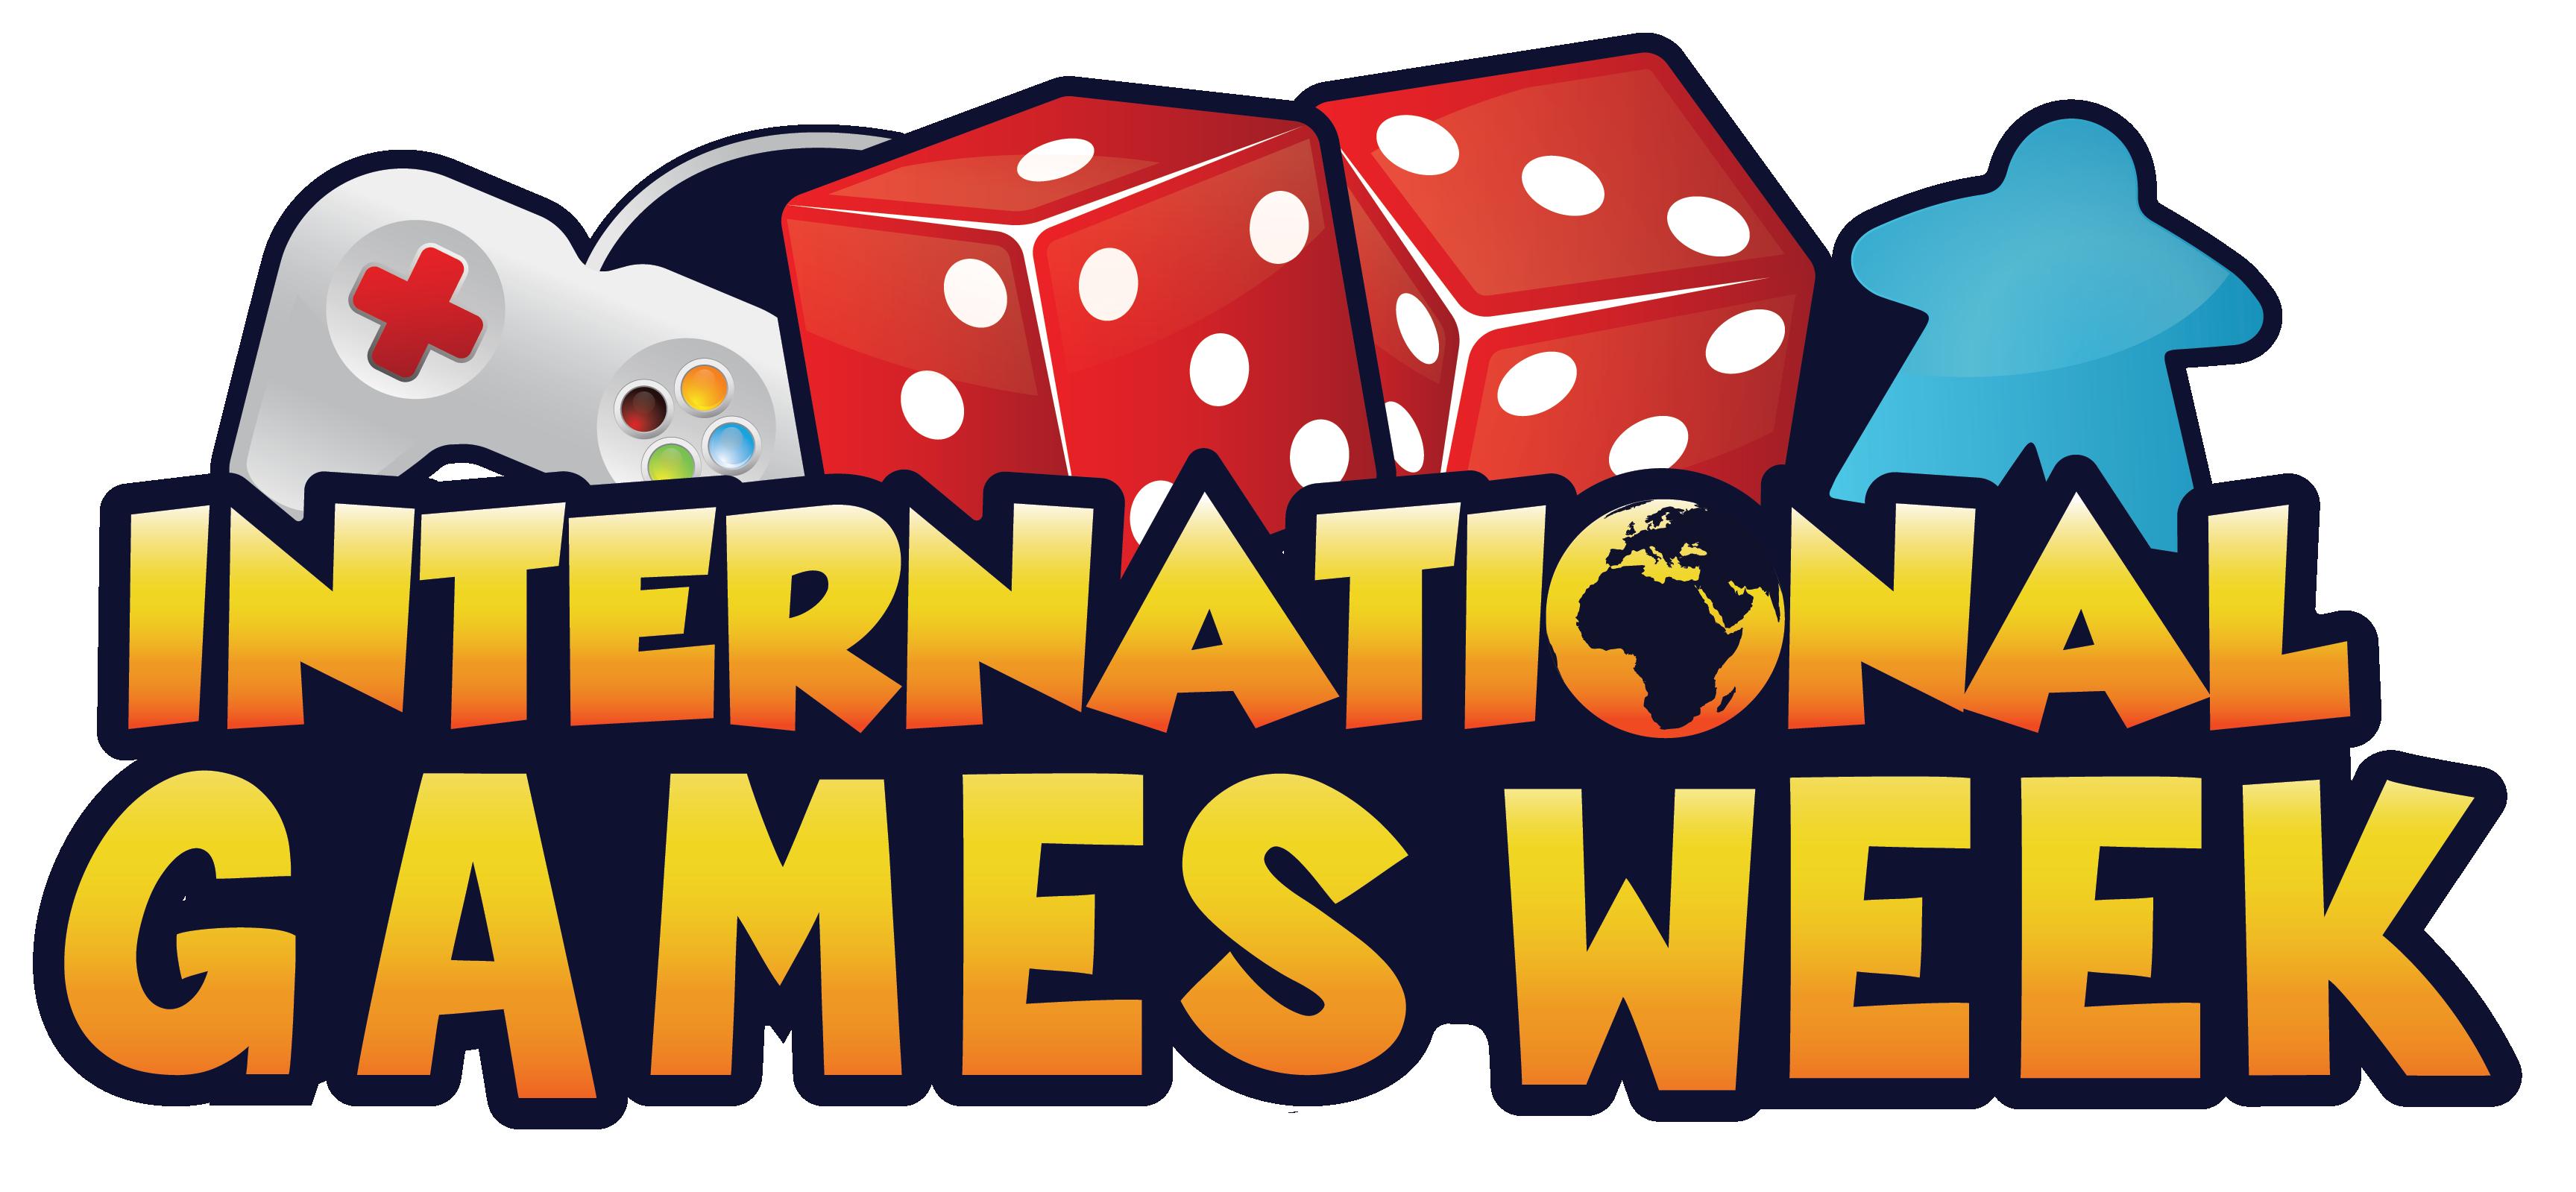 Digital scholarship blog games. Gaming clipart dice card